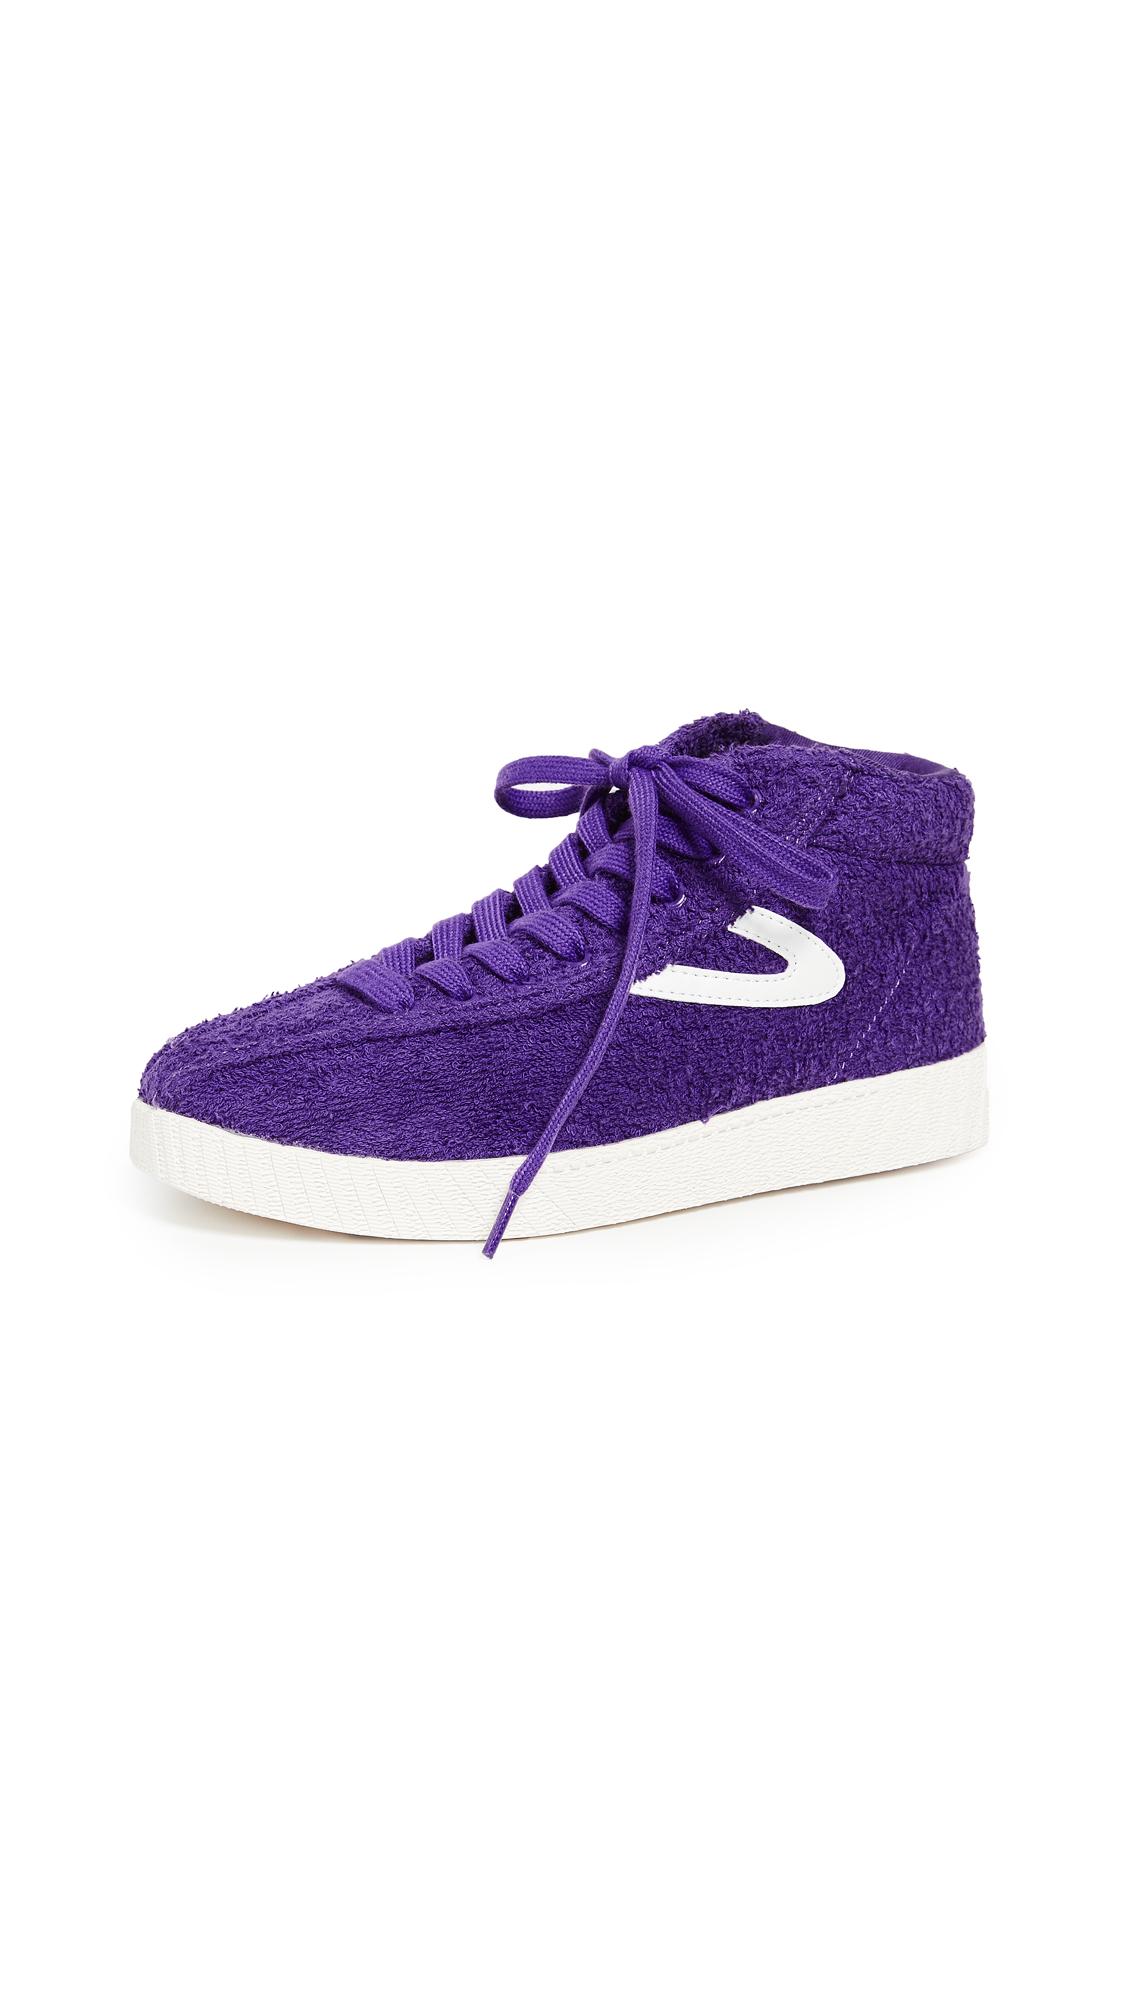 Tretorn Terry High Top Sneakers - Vibrant Purple